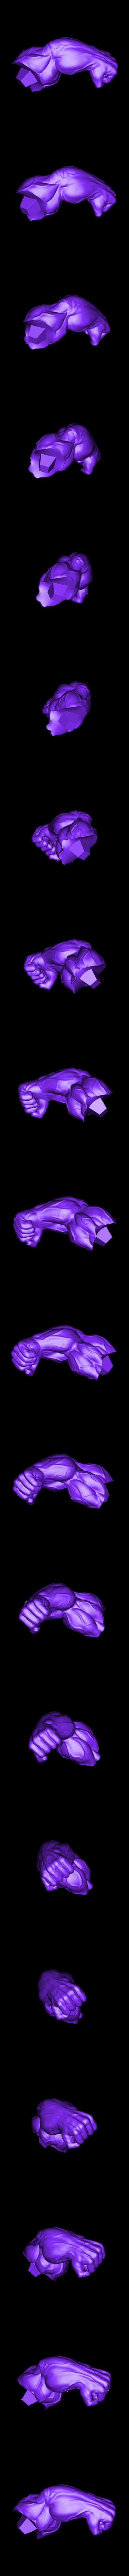 Lhand_225mm.stl Download STL file Hulk Angry - Super Hero - Marvel 3D print model • 3D print model, Bstar3Dart